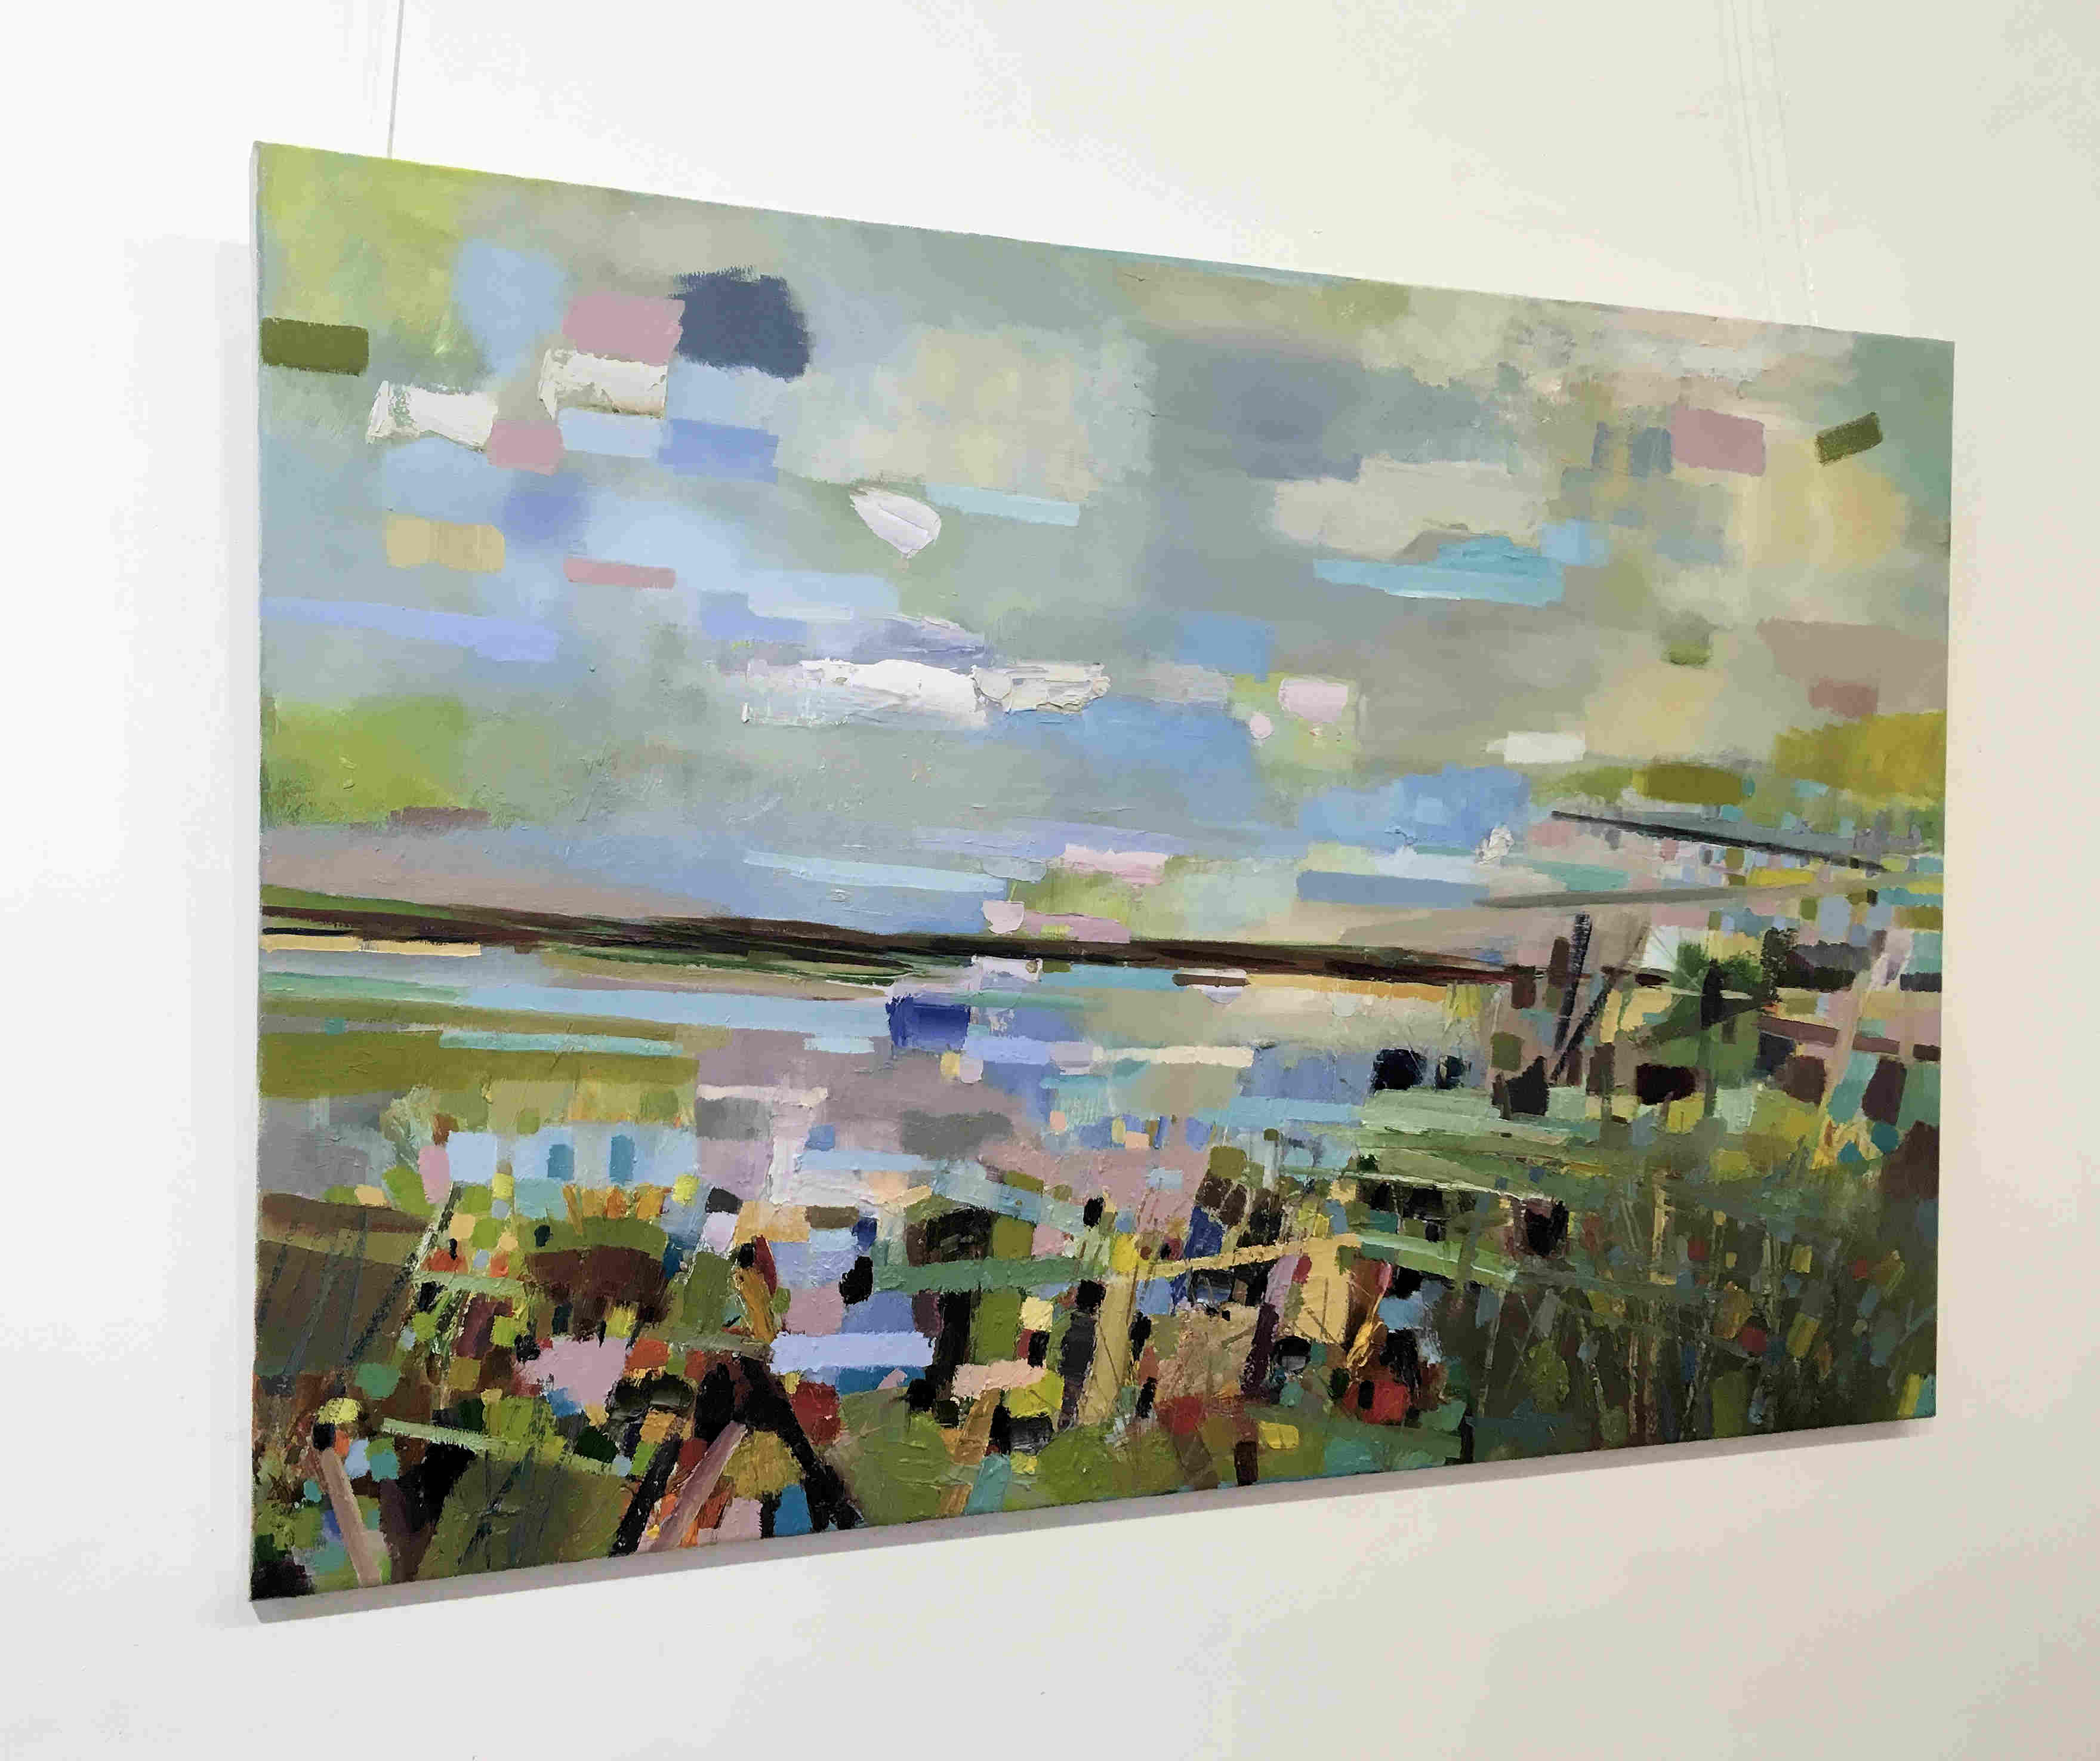 'Coast' by artist John Gerard Anusas